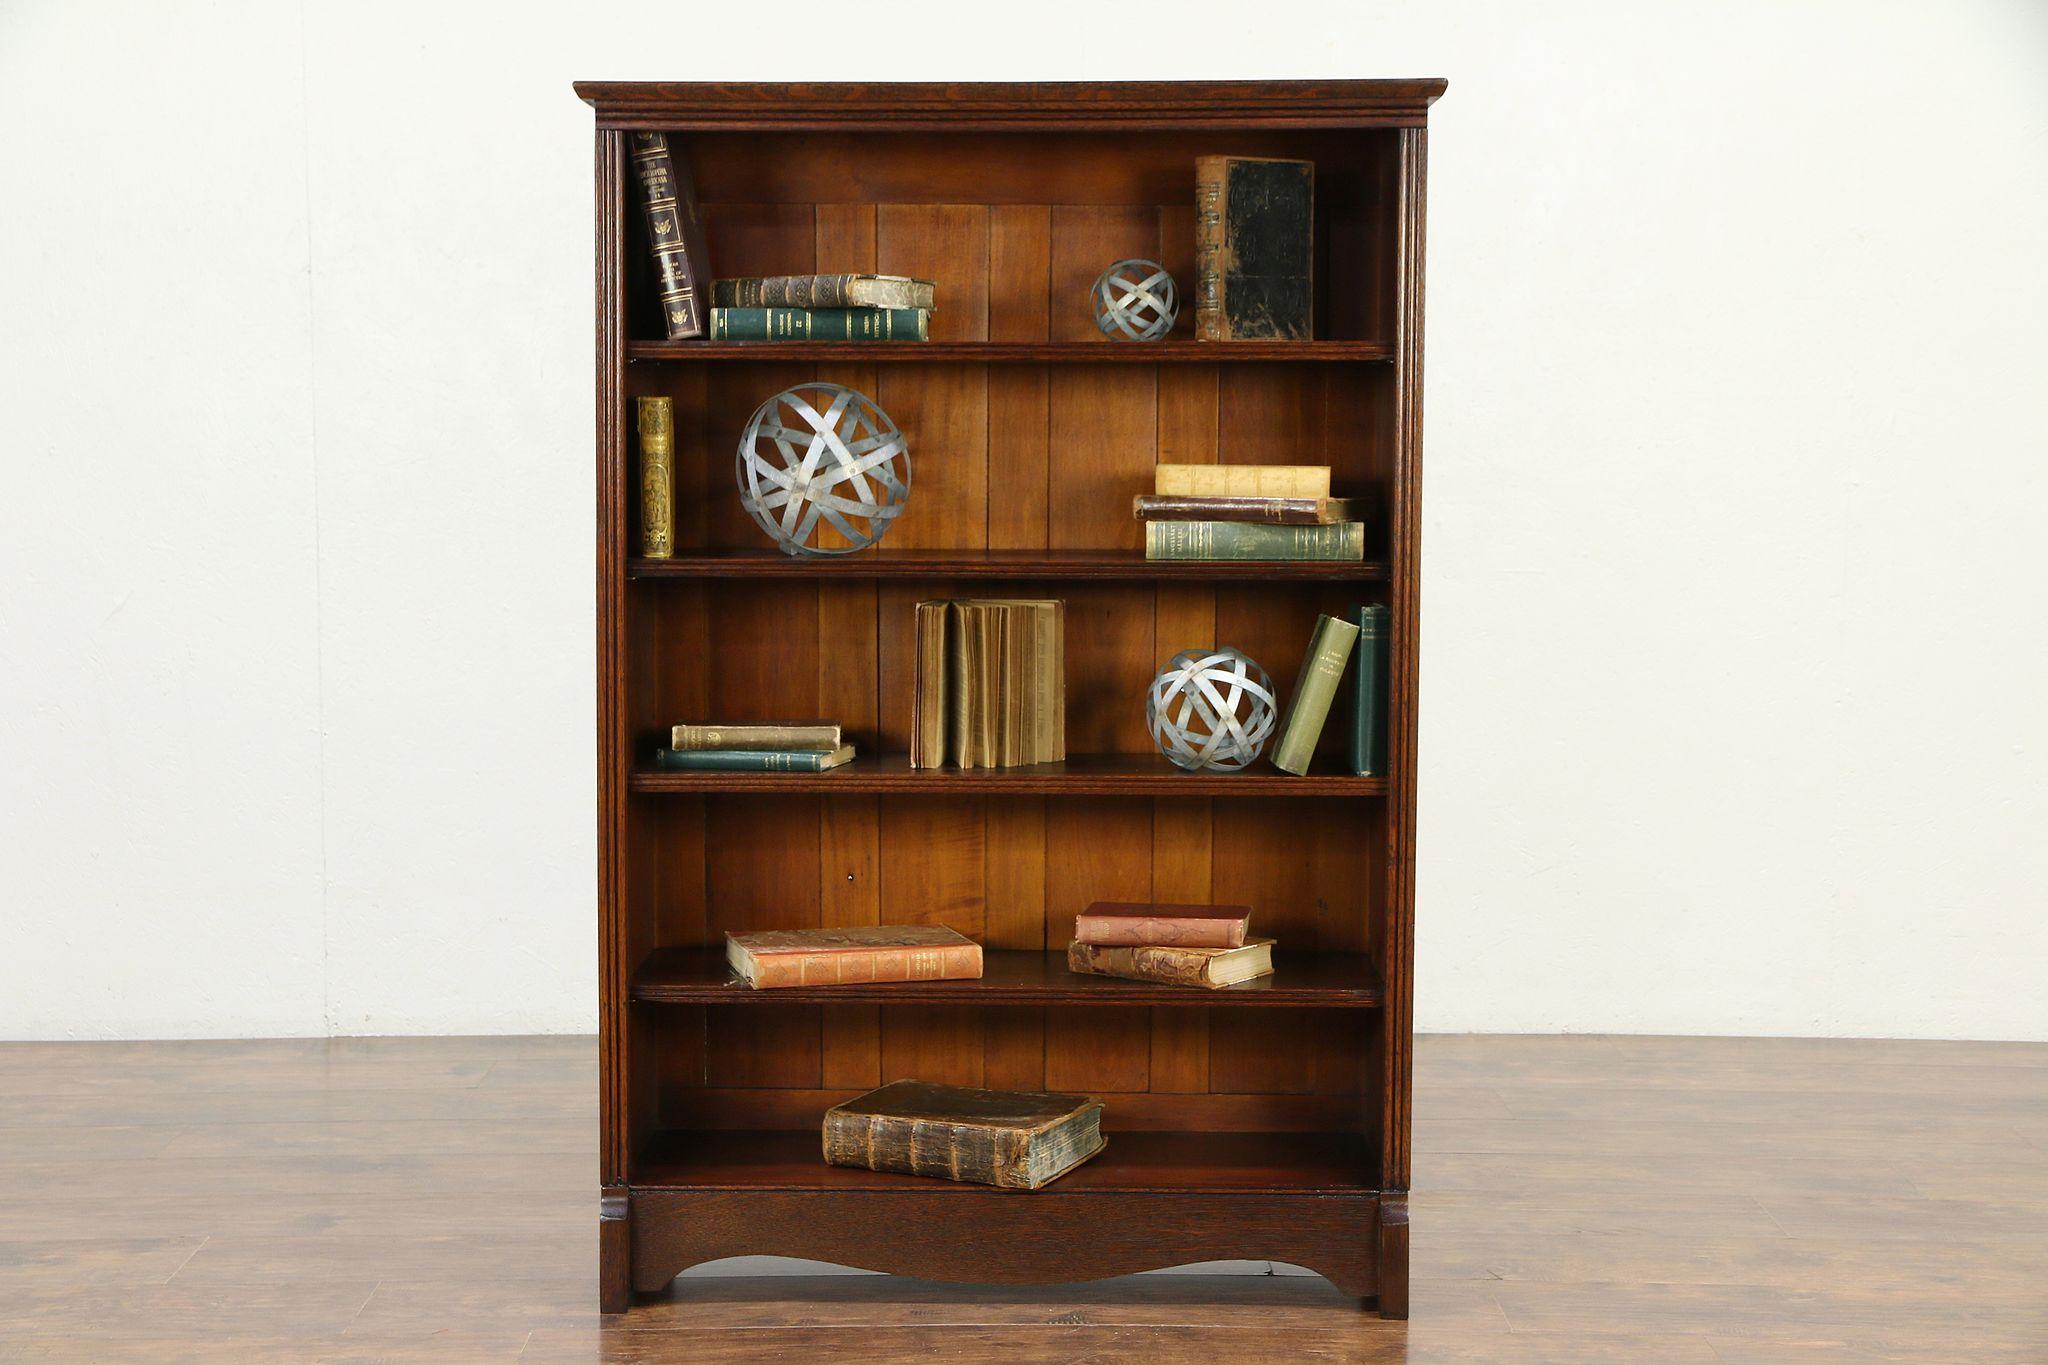 Oak Victorian Antique Bookcase Or Library Bookshelf Bath Cabinet 30110